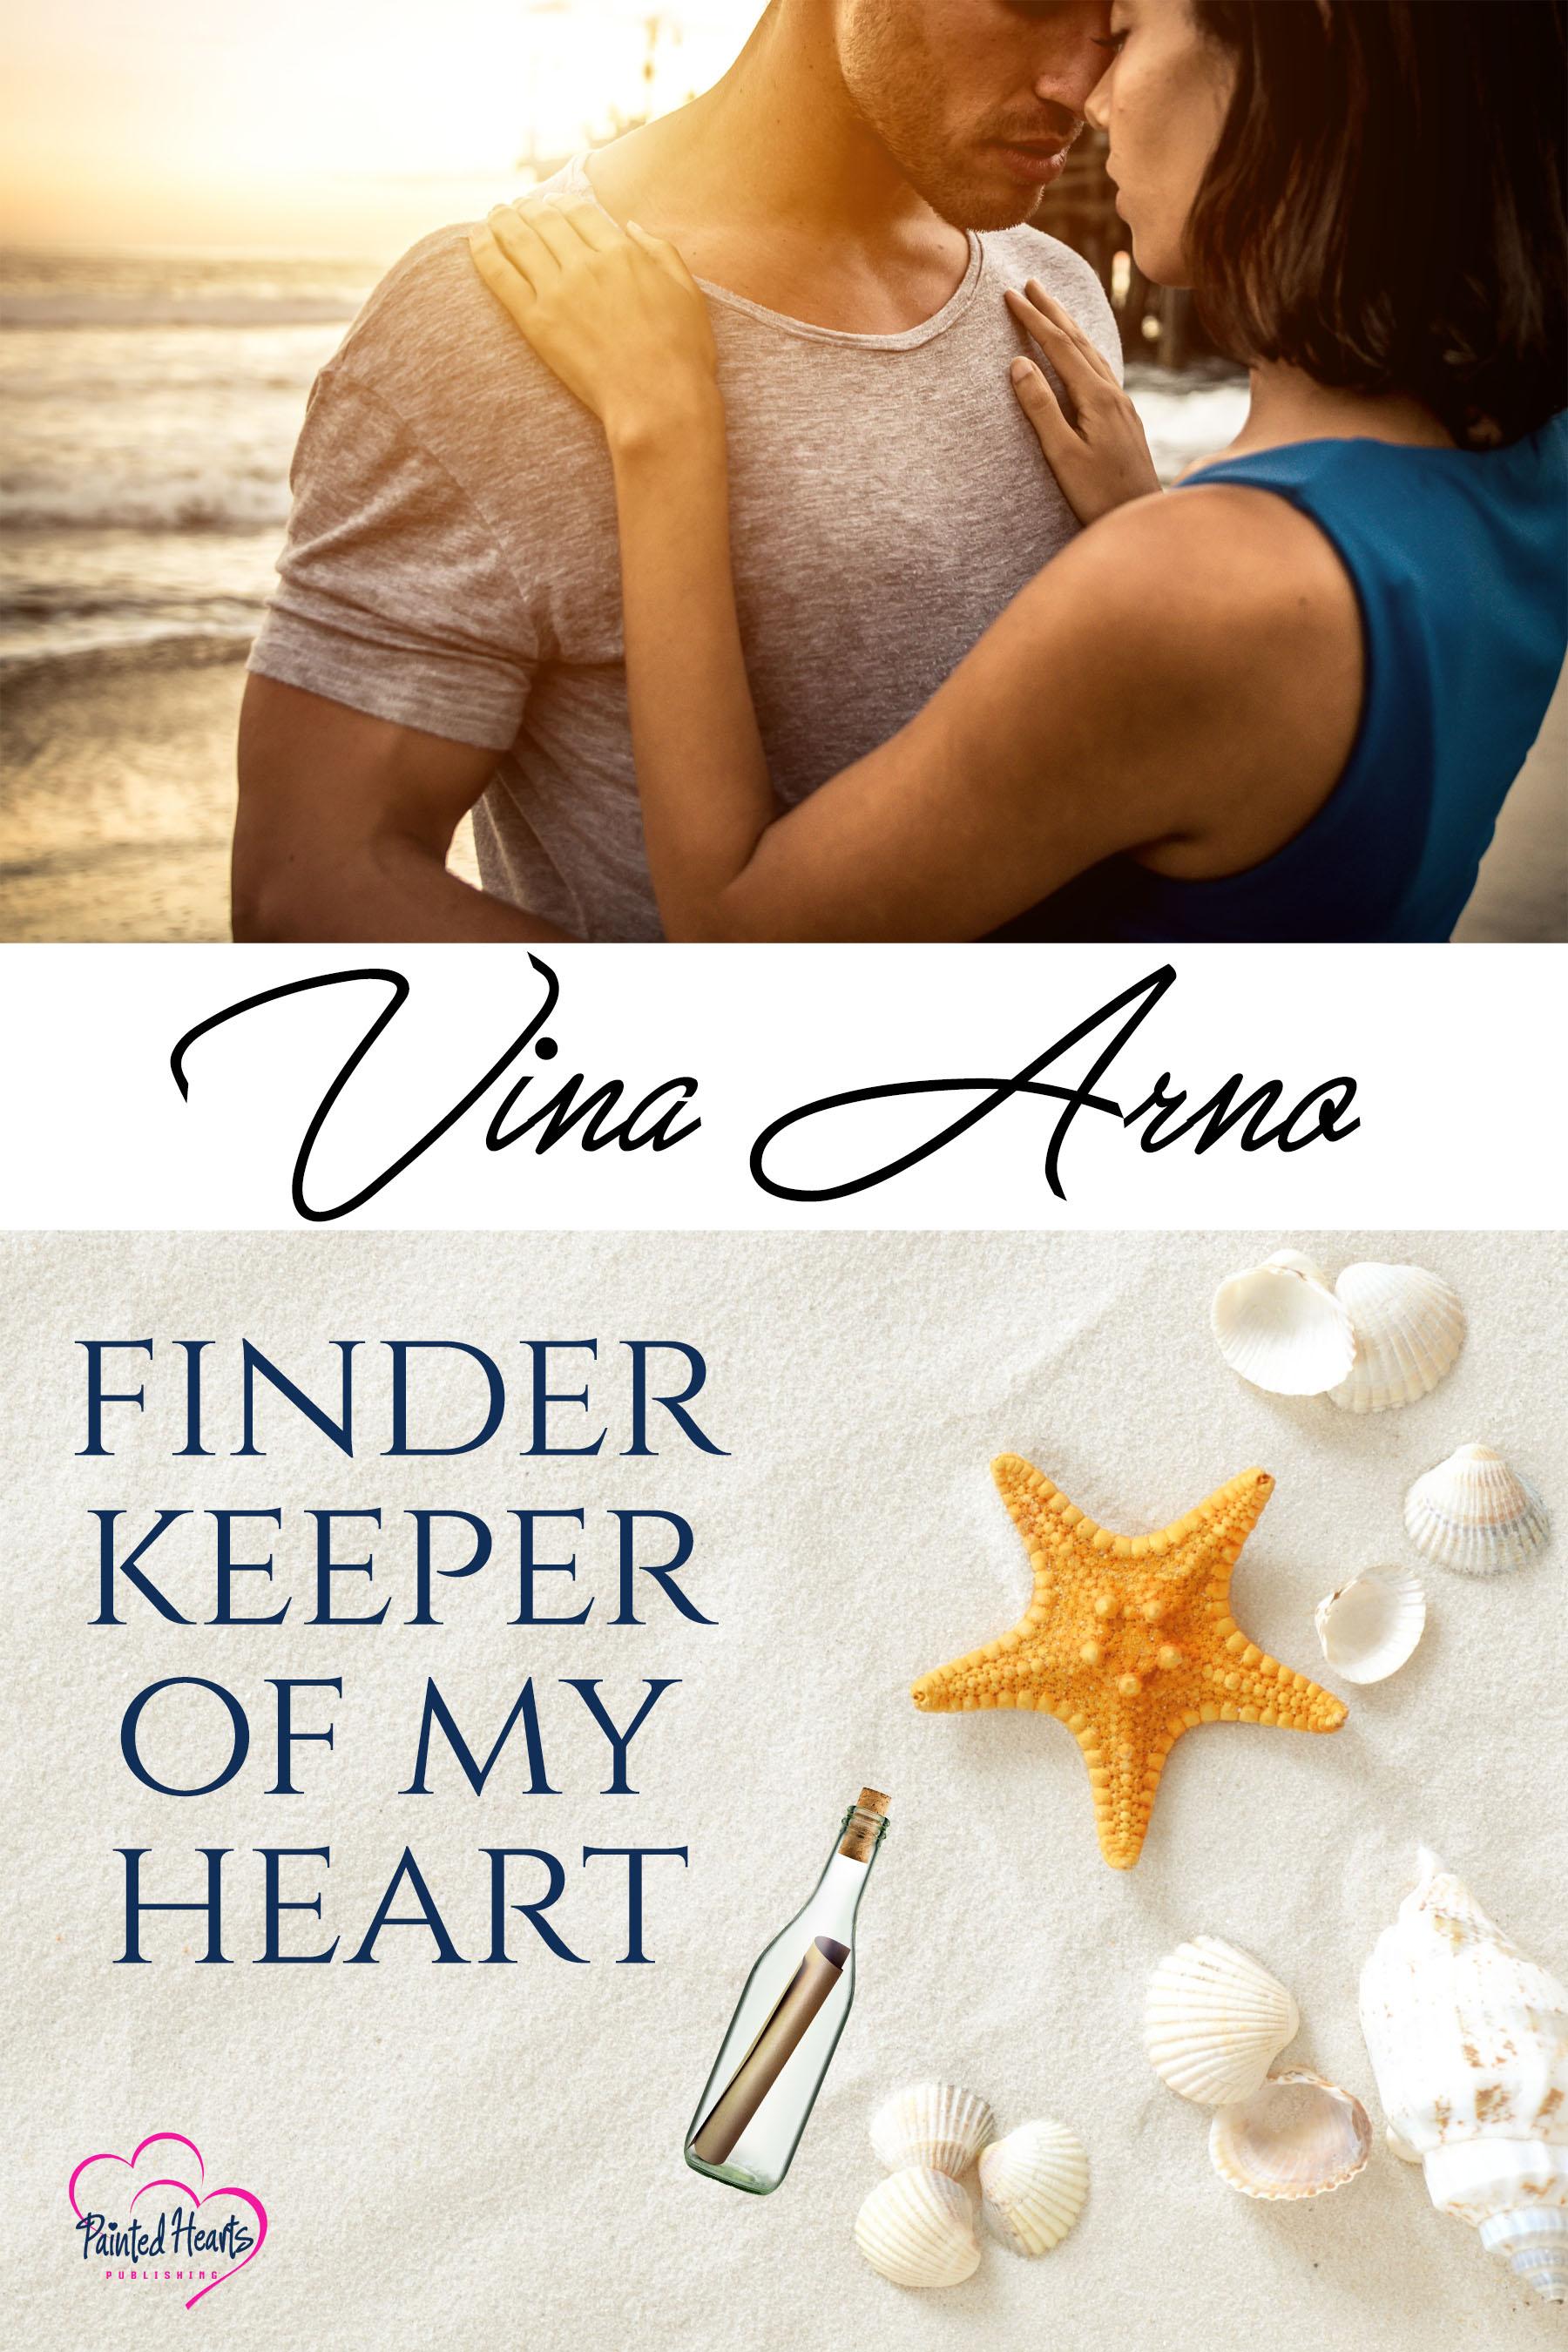 finder-keeper-of-my-heart-vina-arno-paintedhearts.jpg